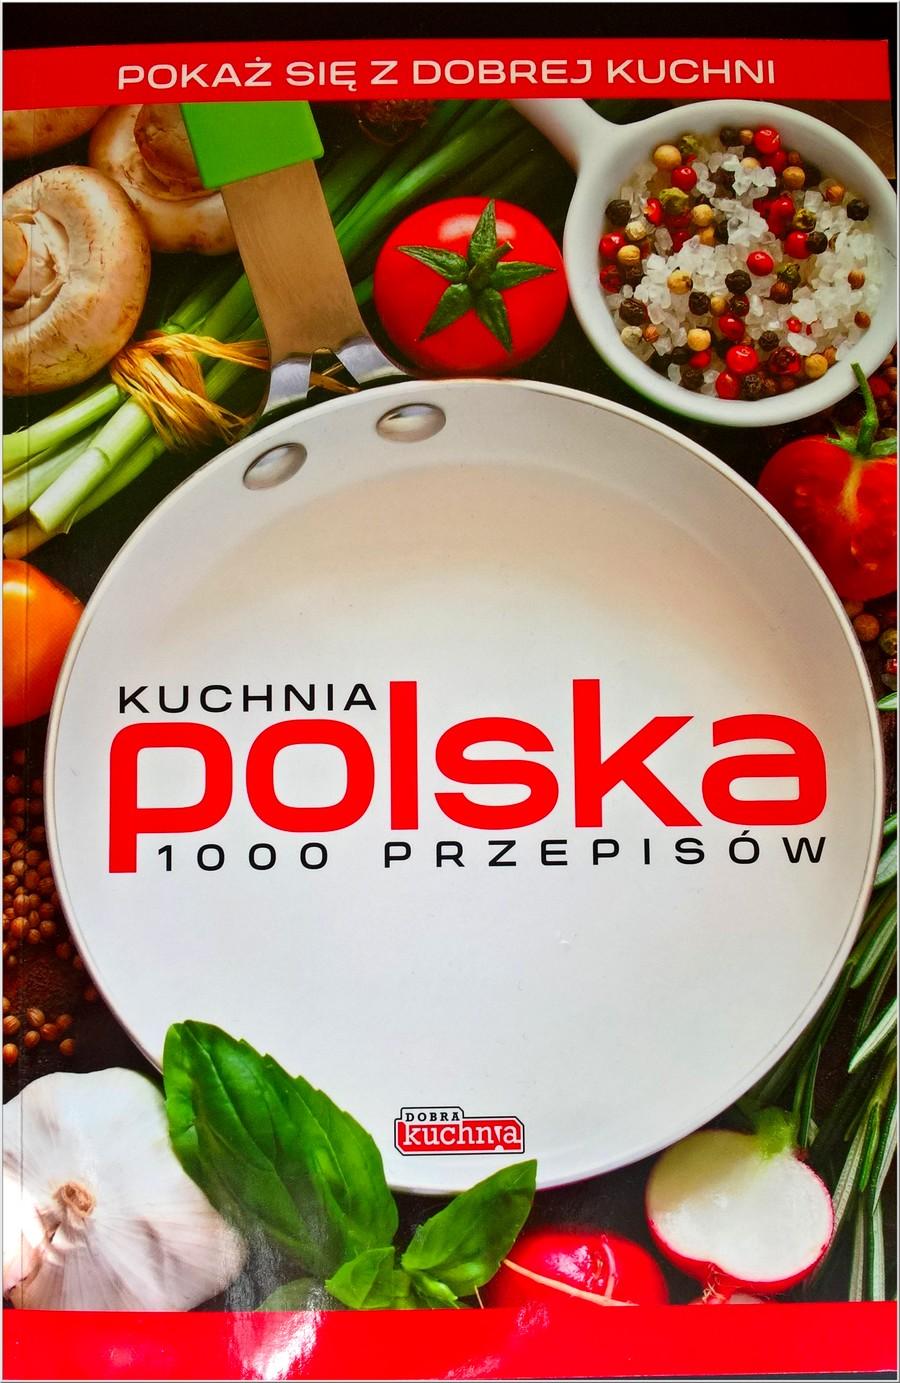 Kuchnia Polska 1000 Przepisow Ksiazka Kucharska Idealna Dla Kazdego Slodkie Okruszki